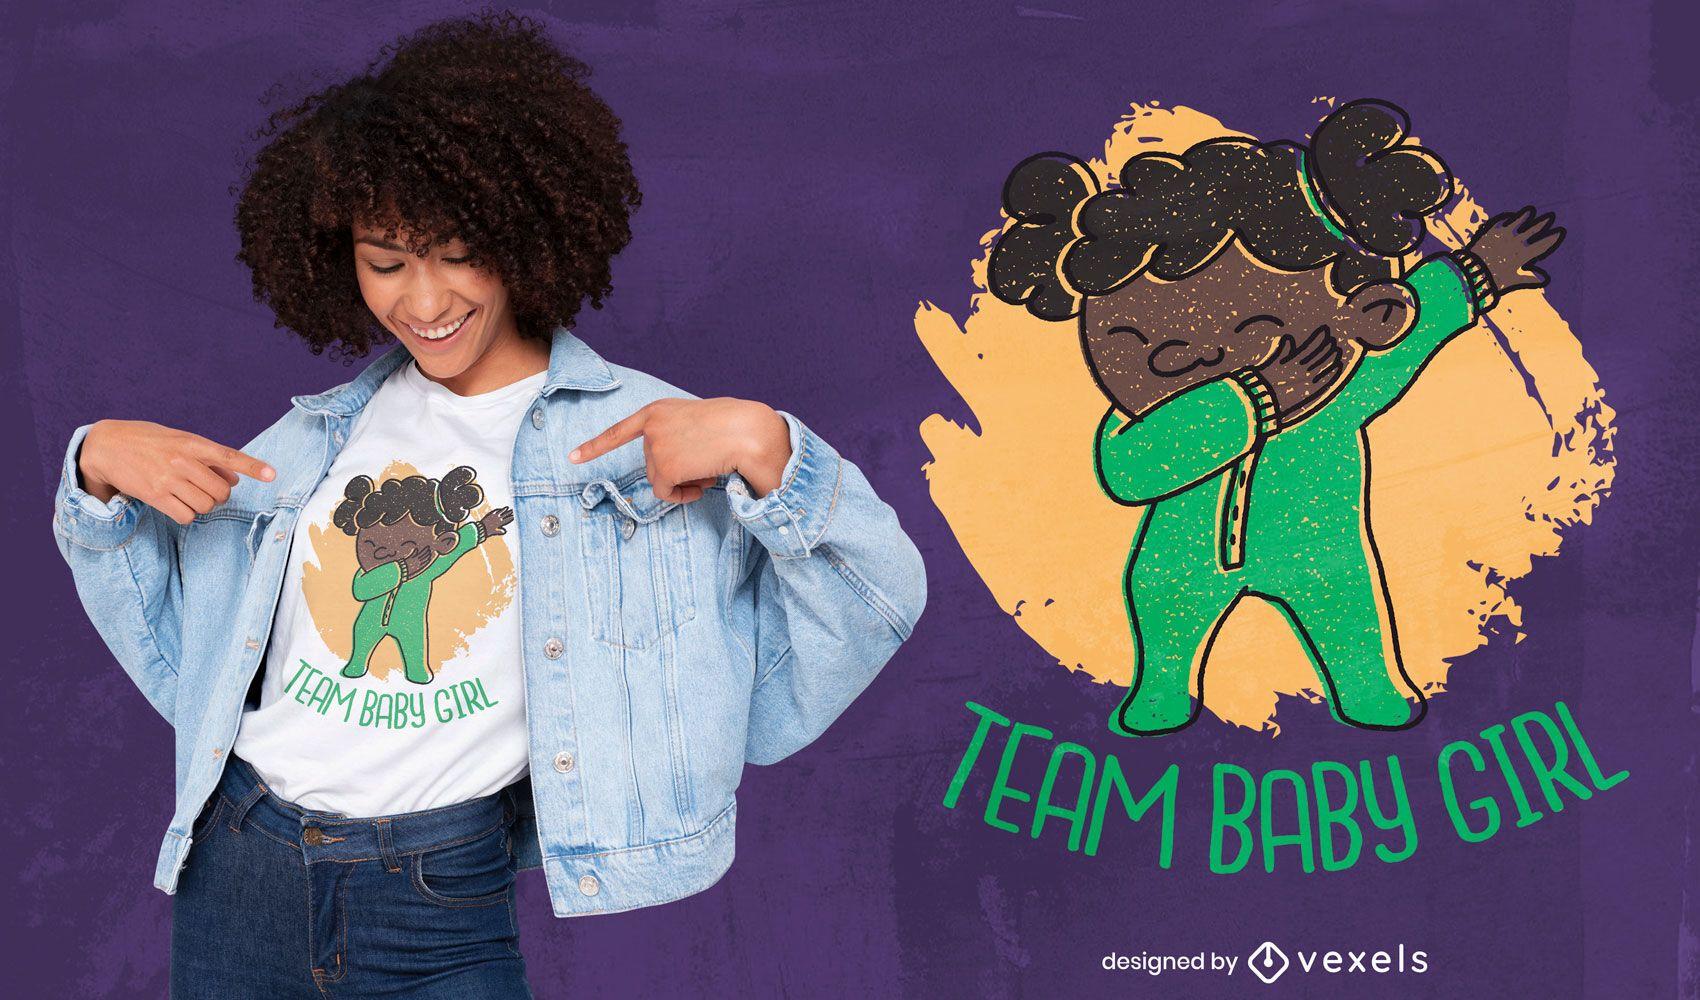 Baby girl dabbing funny t-shirt design